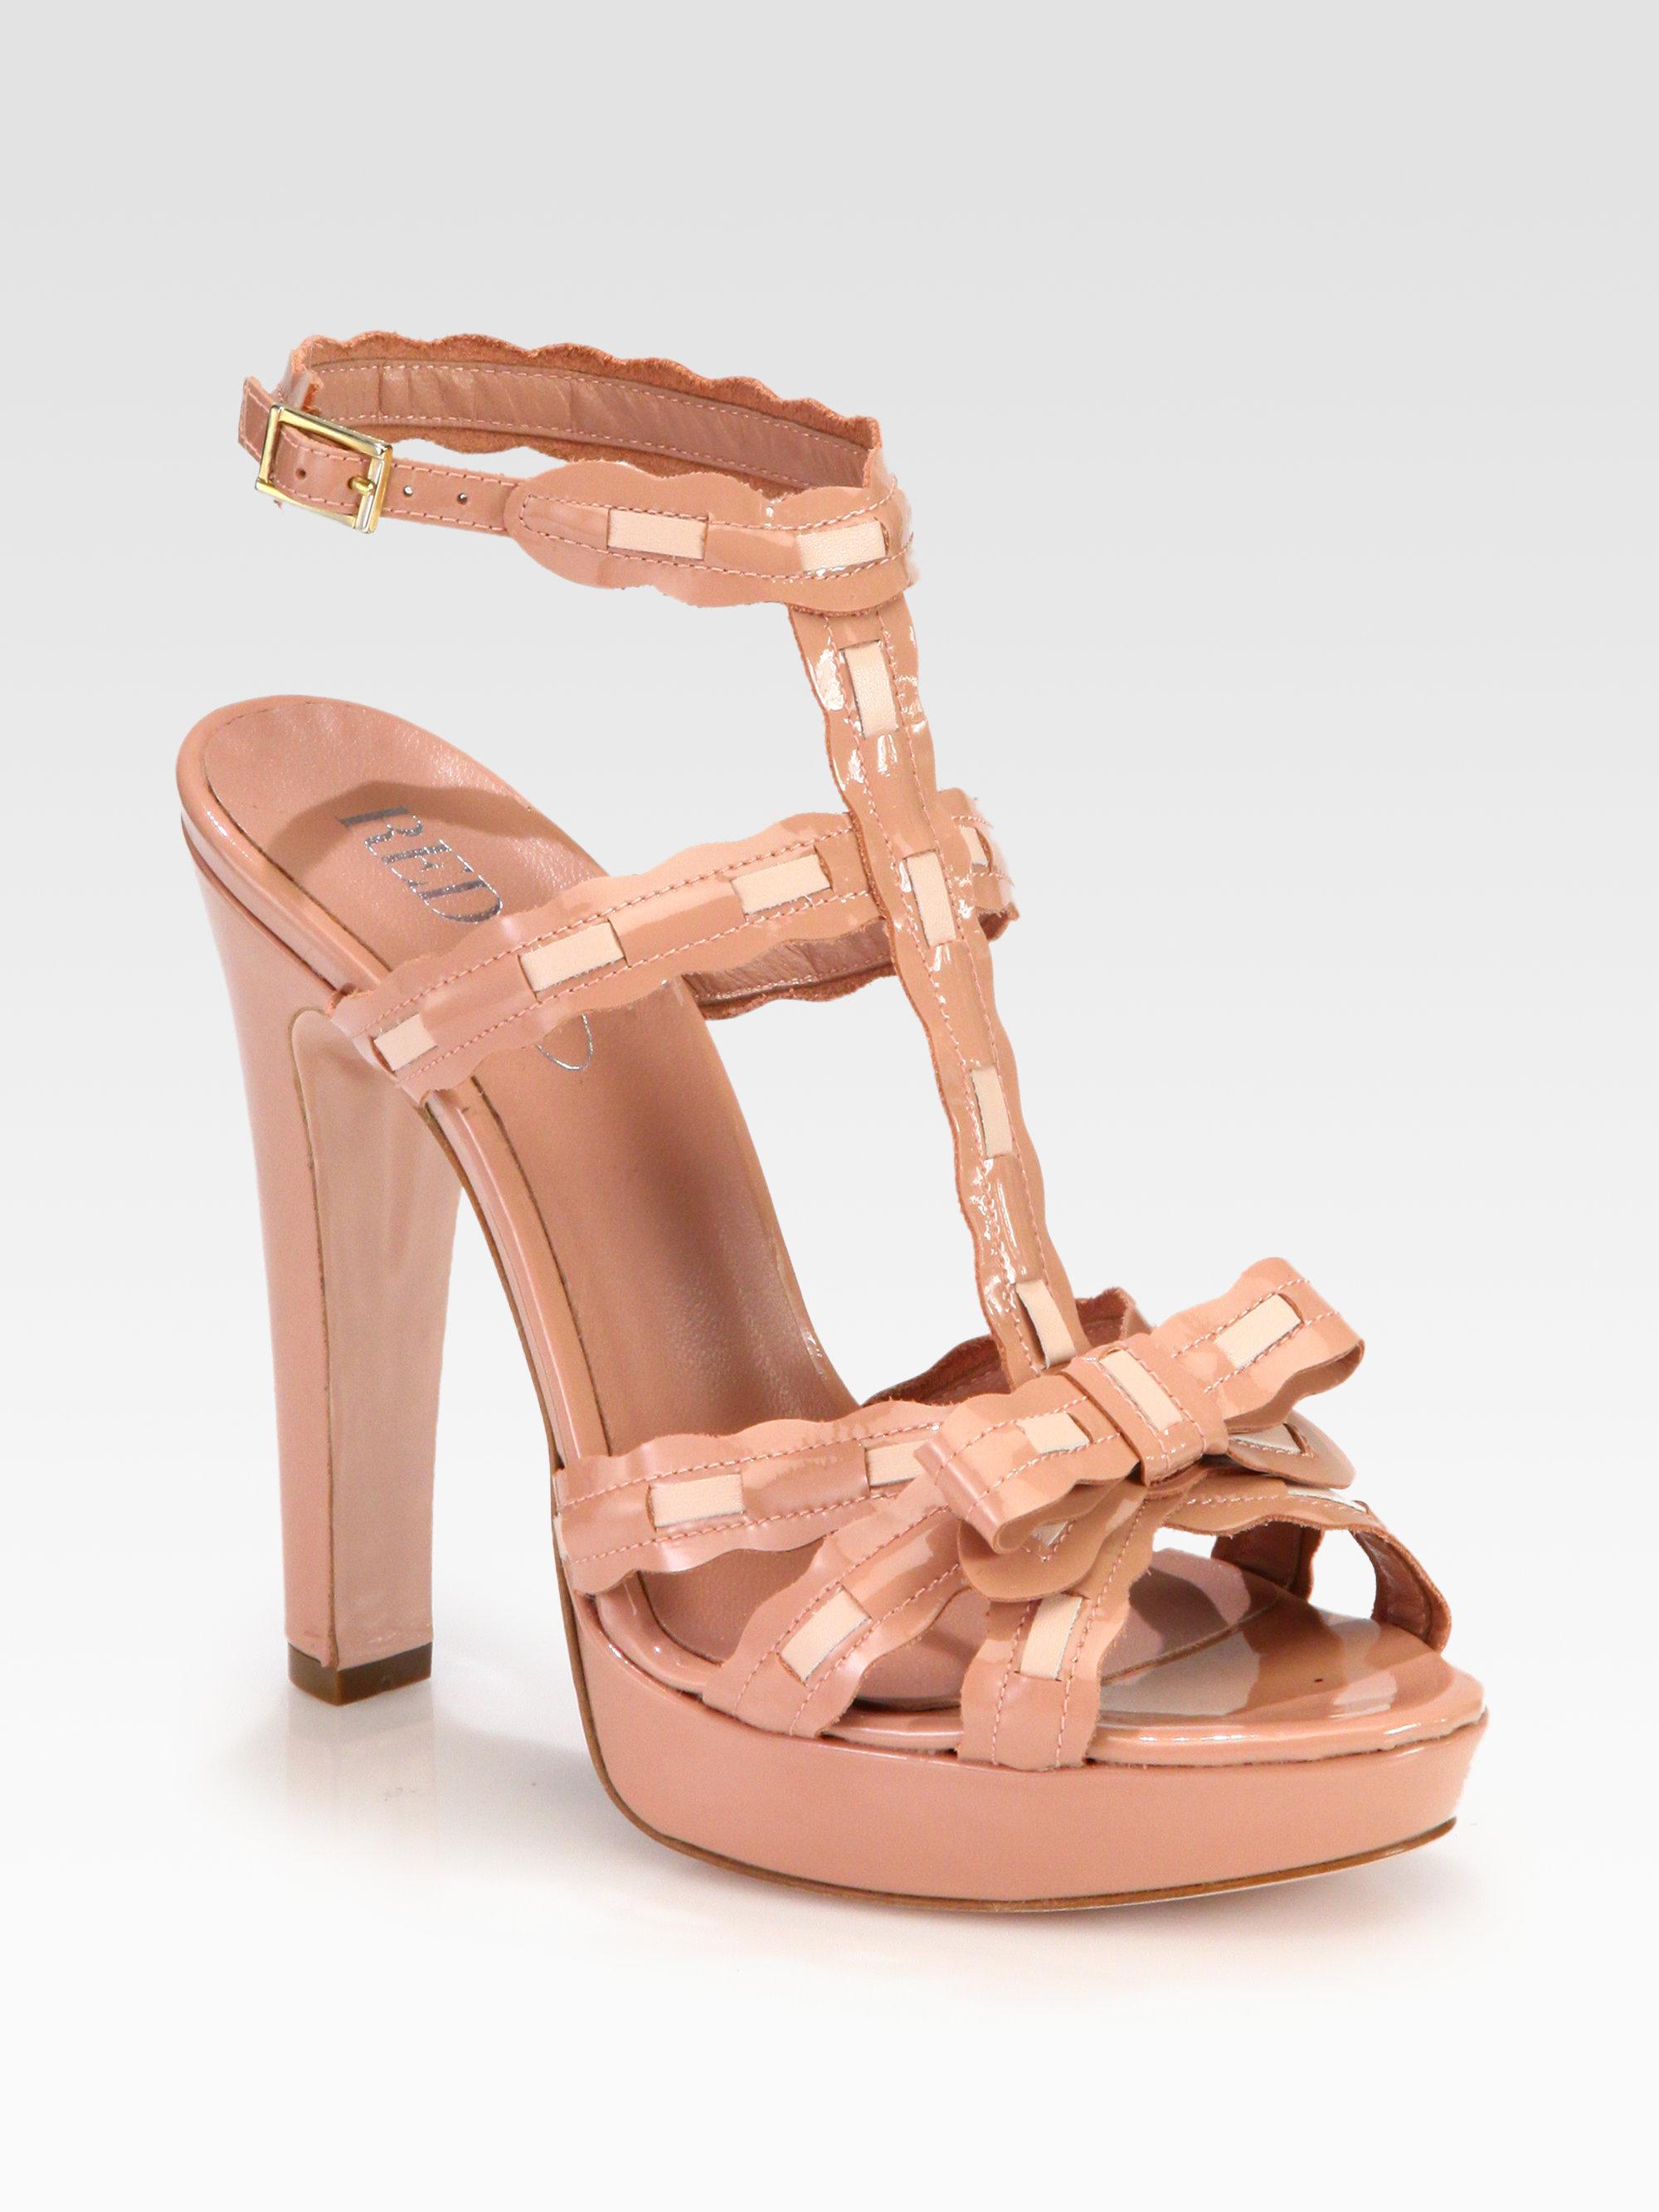 buy cheap shop sale best Red Valentino platform sandals for nice cheap online x1aF3